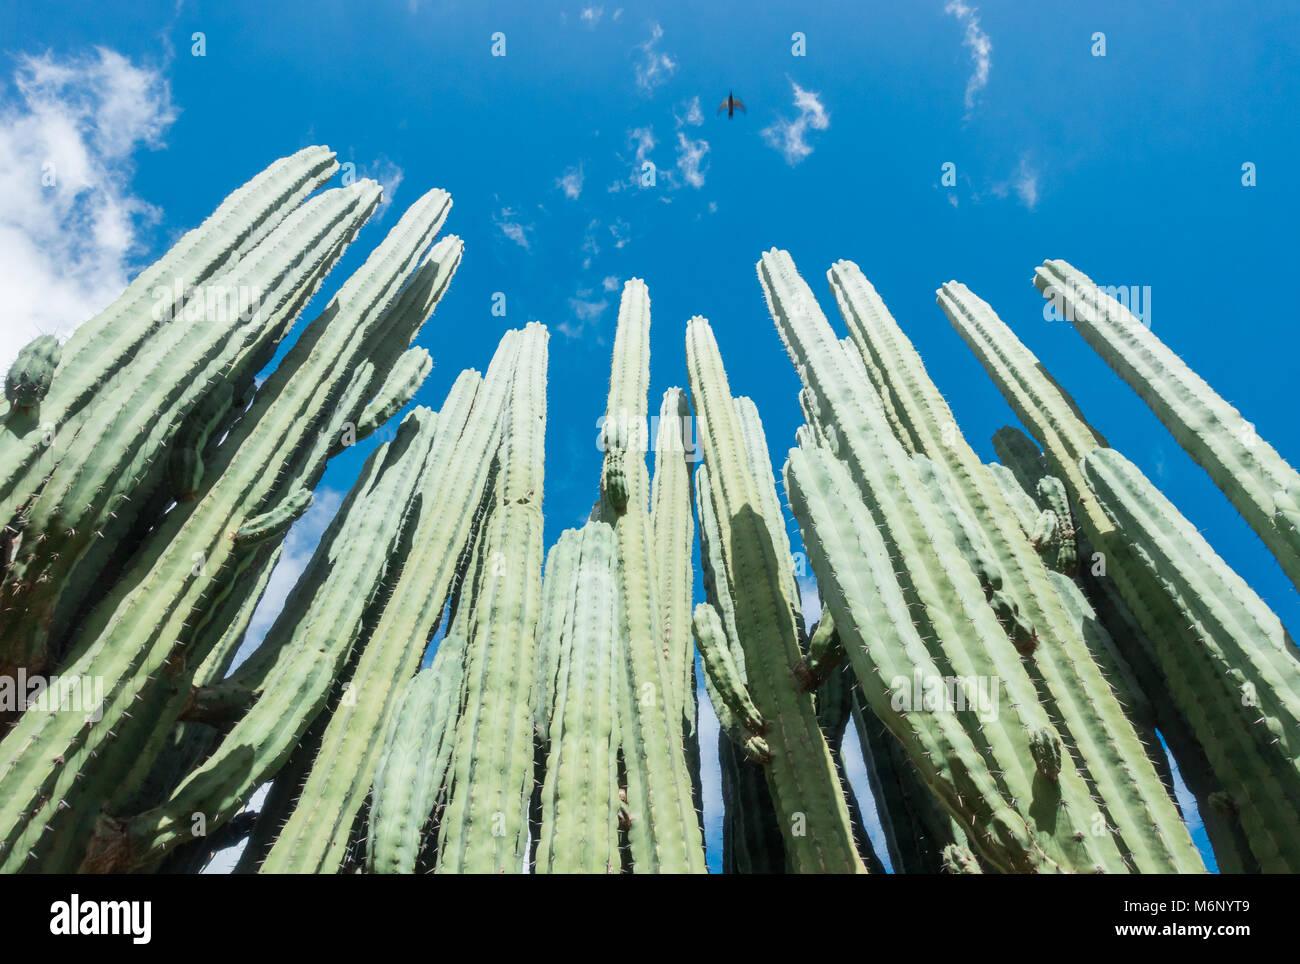 Pachycereus marginatus cactus in Jardin Canario on Gran Canaria, Canary Islands, Spain - Stock Image